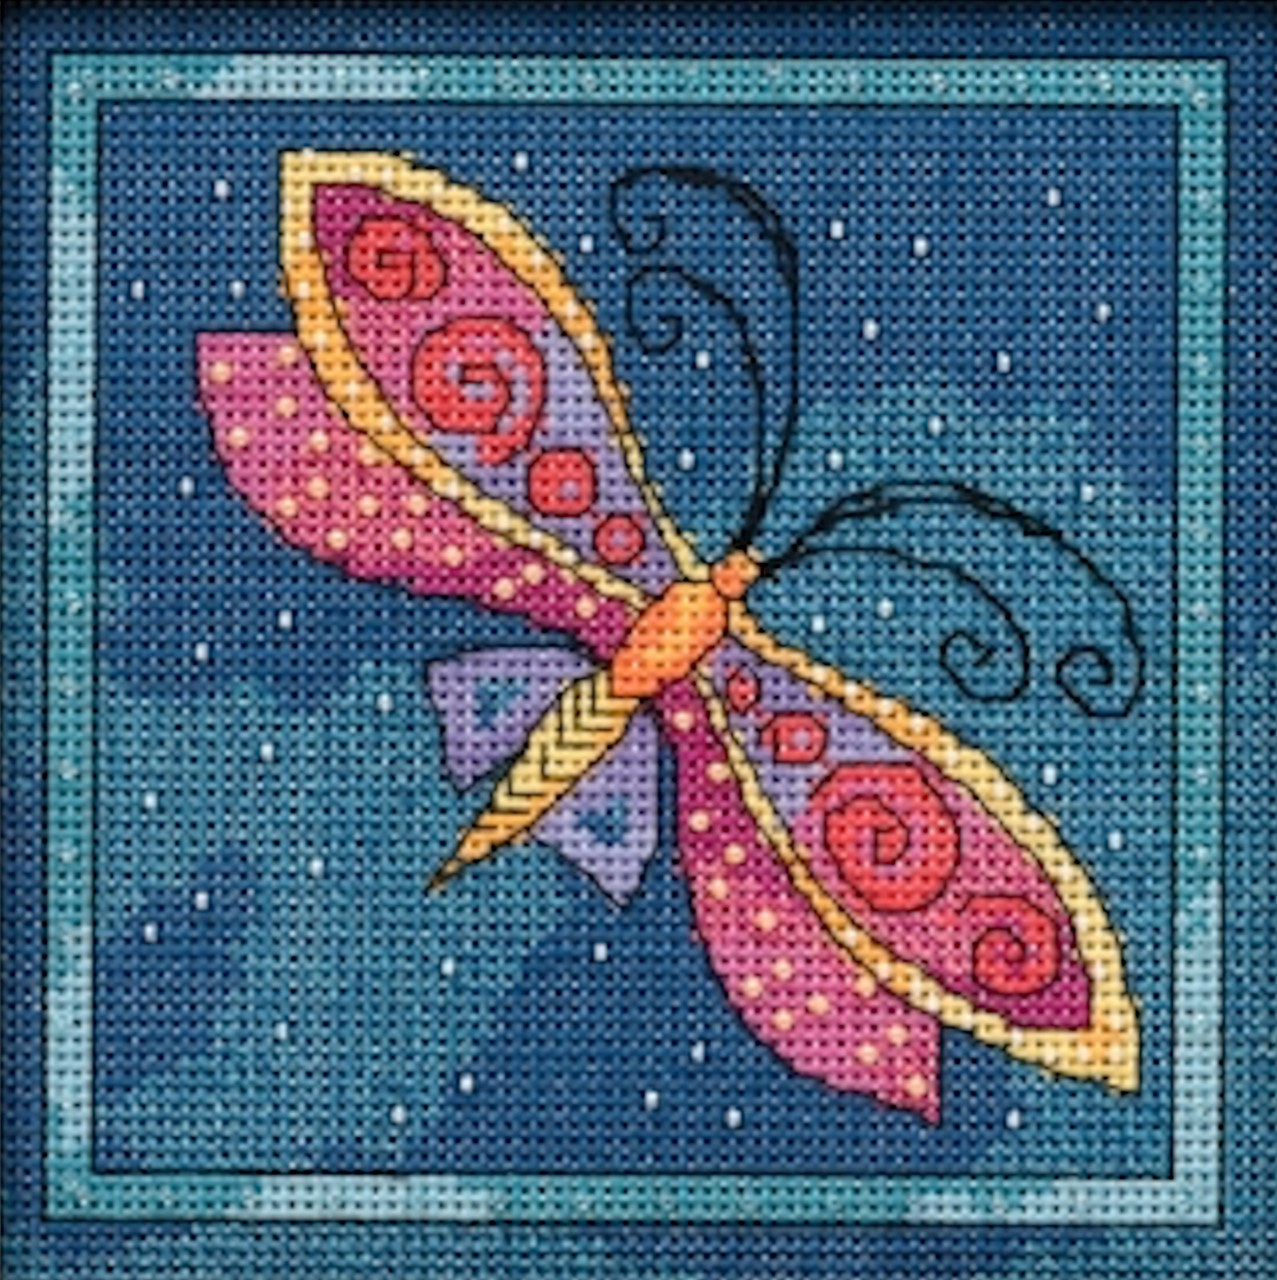 2019 Mill Hill Laurel Burch Flying Colors - Dragonfly Capri